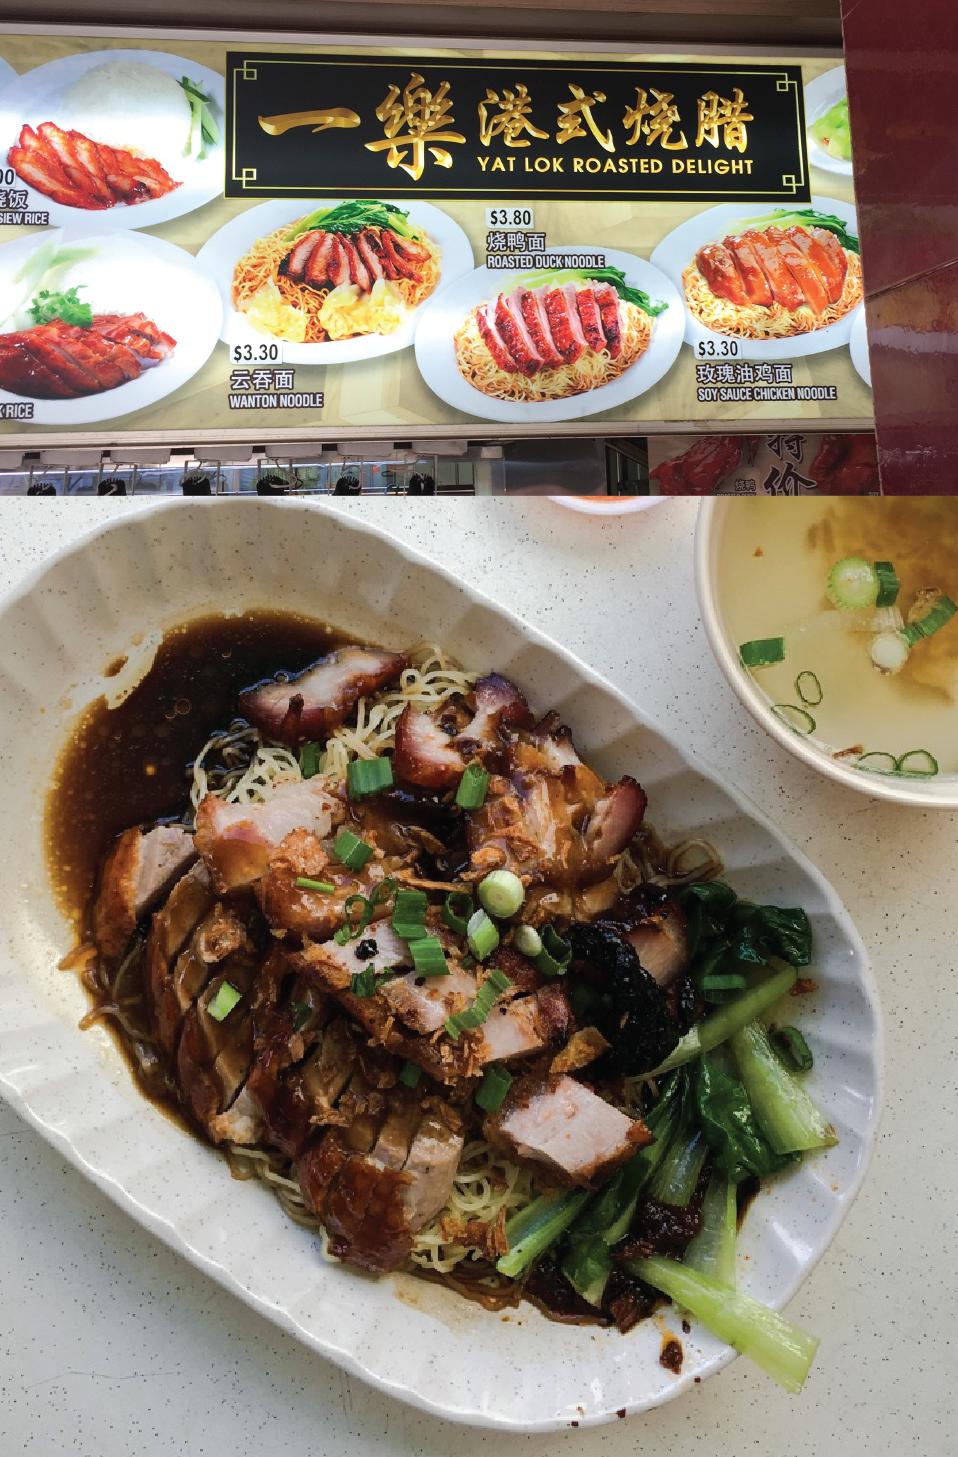 Yat Lok Roasted Delight